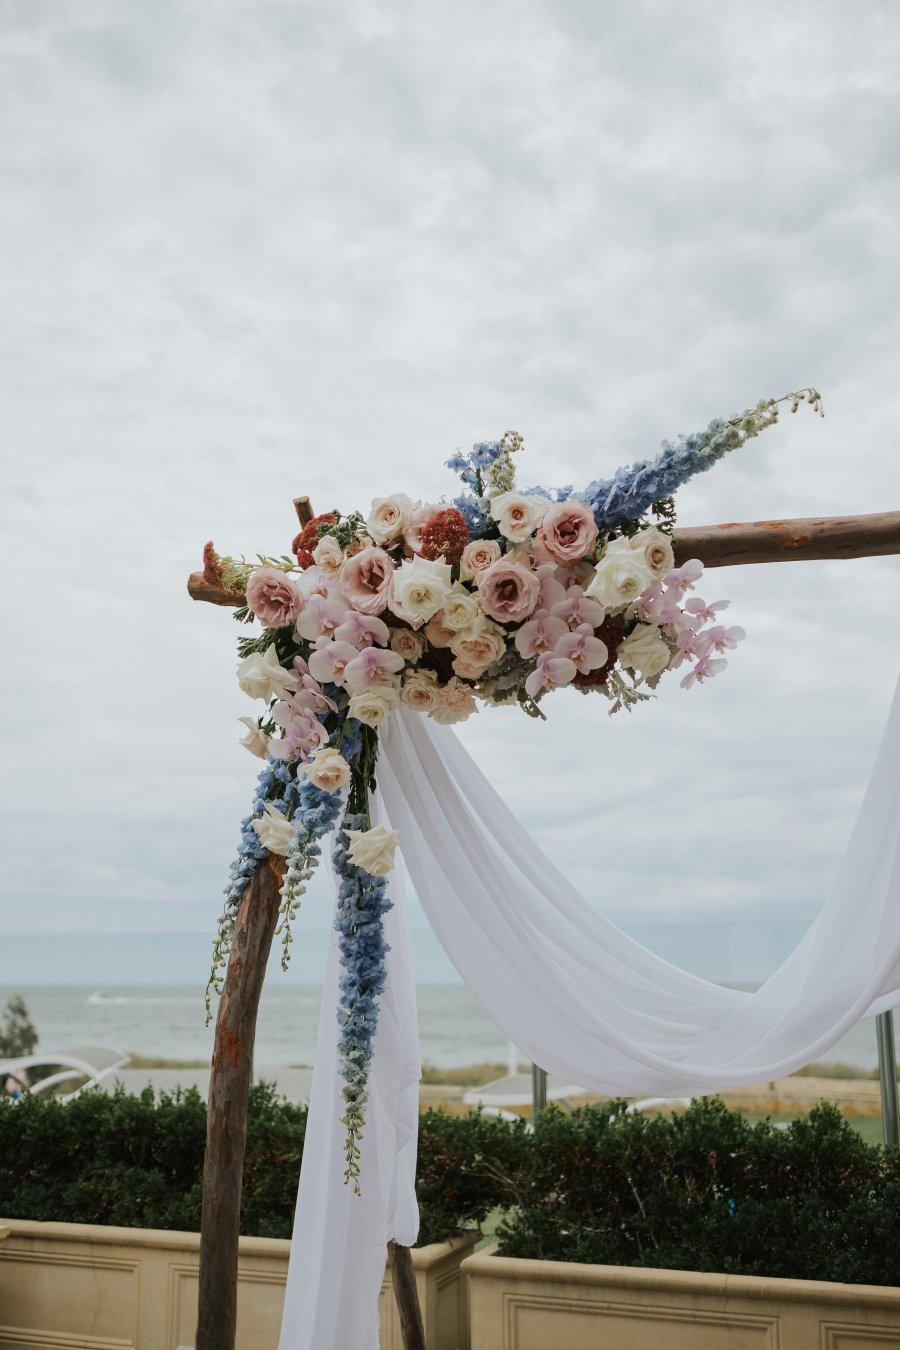 Kate + Graeme | Mindarie Wedding | Ebony Blush Photography | Zoe Theiadore | Perth wedding Photographer64